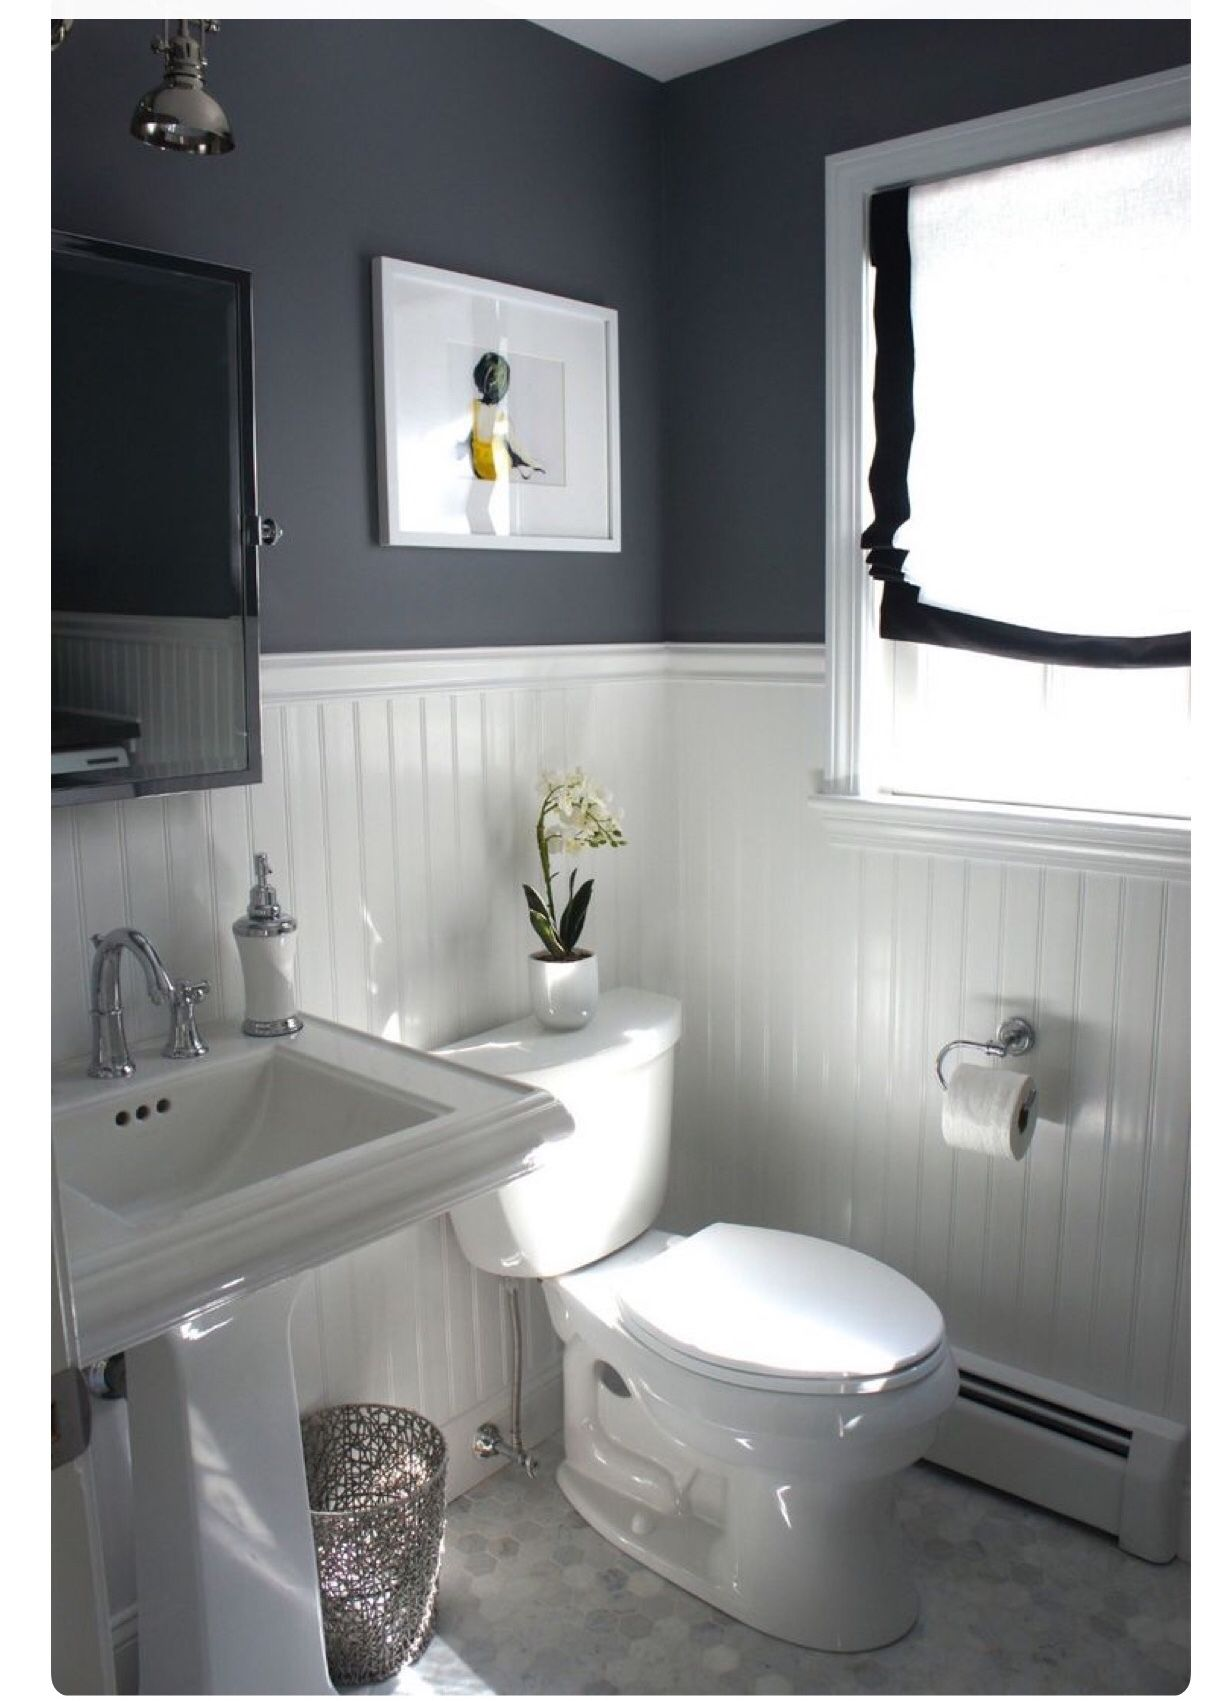 Pin by Ang. R on Home decor | Pinterest | House, Bath and Bathroom ...